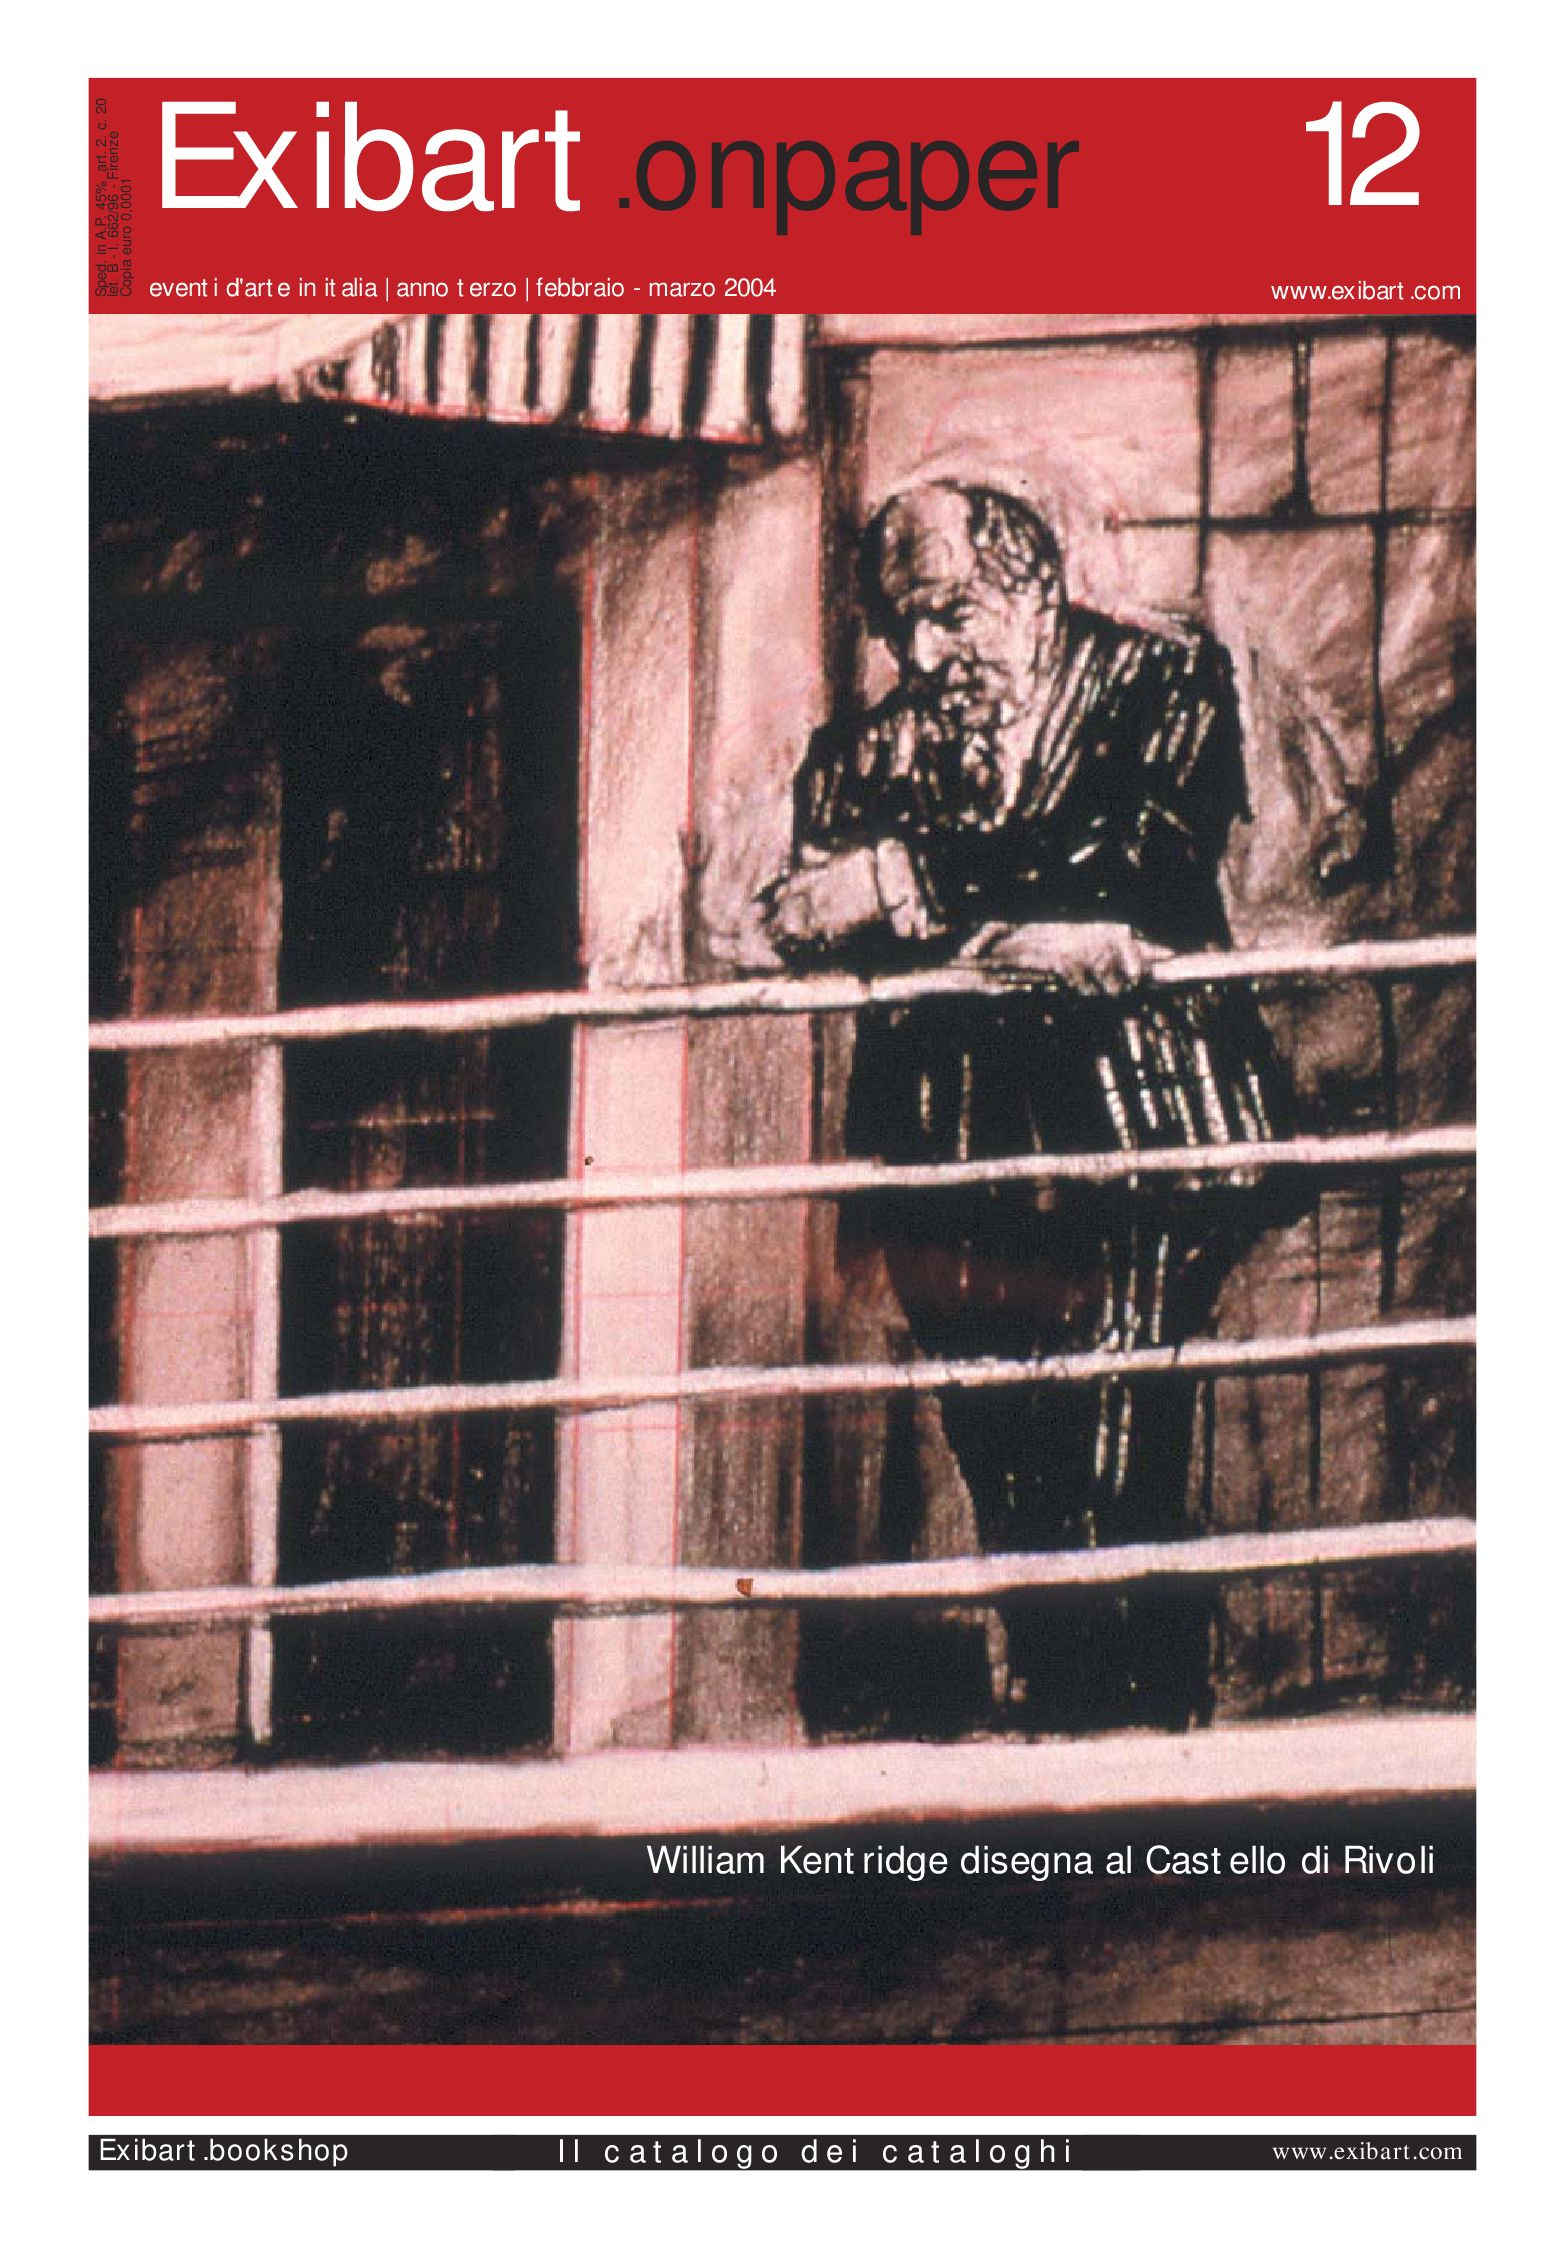 Exibart.onpaper n.09 by exibart srl   issuu